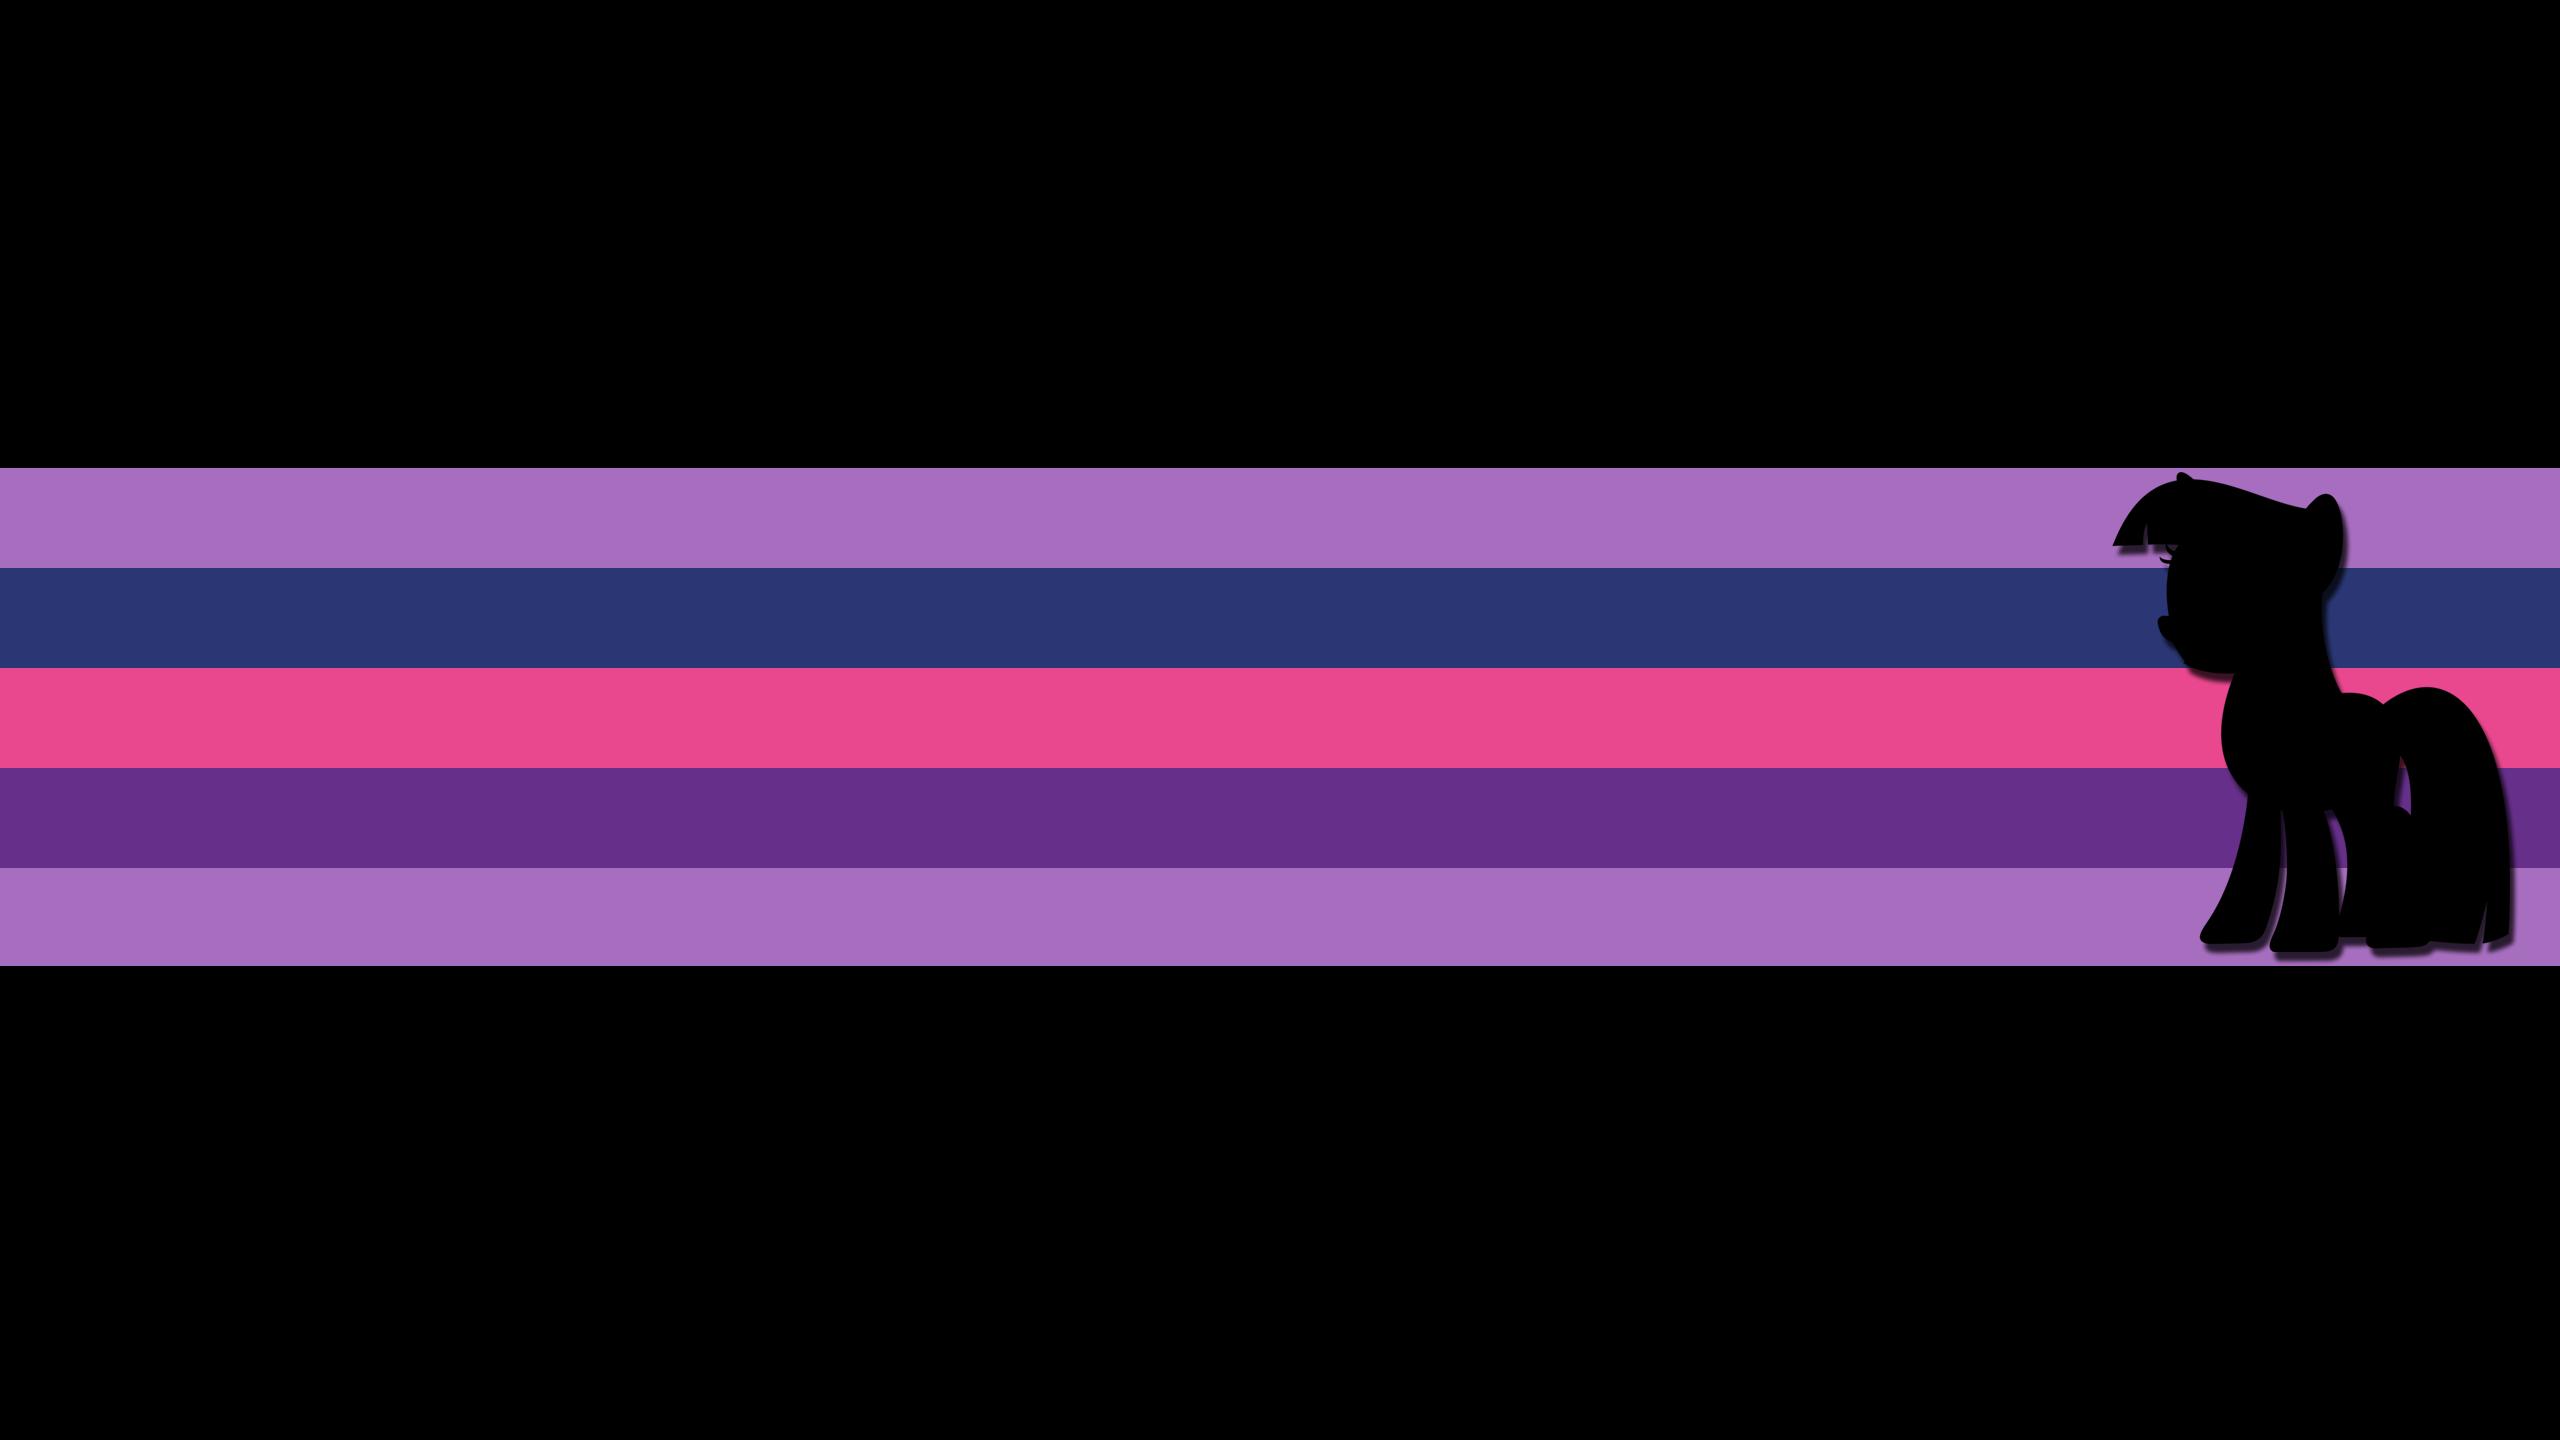 [14] Twilight Sparkle: Colored Stripes by CaptRainbows and DoktorRainbowFridge